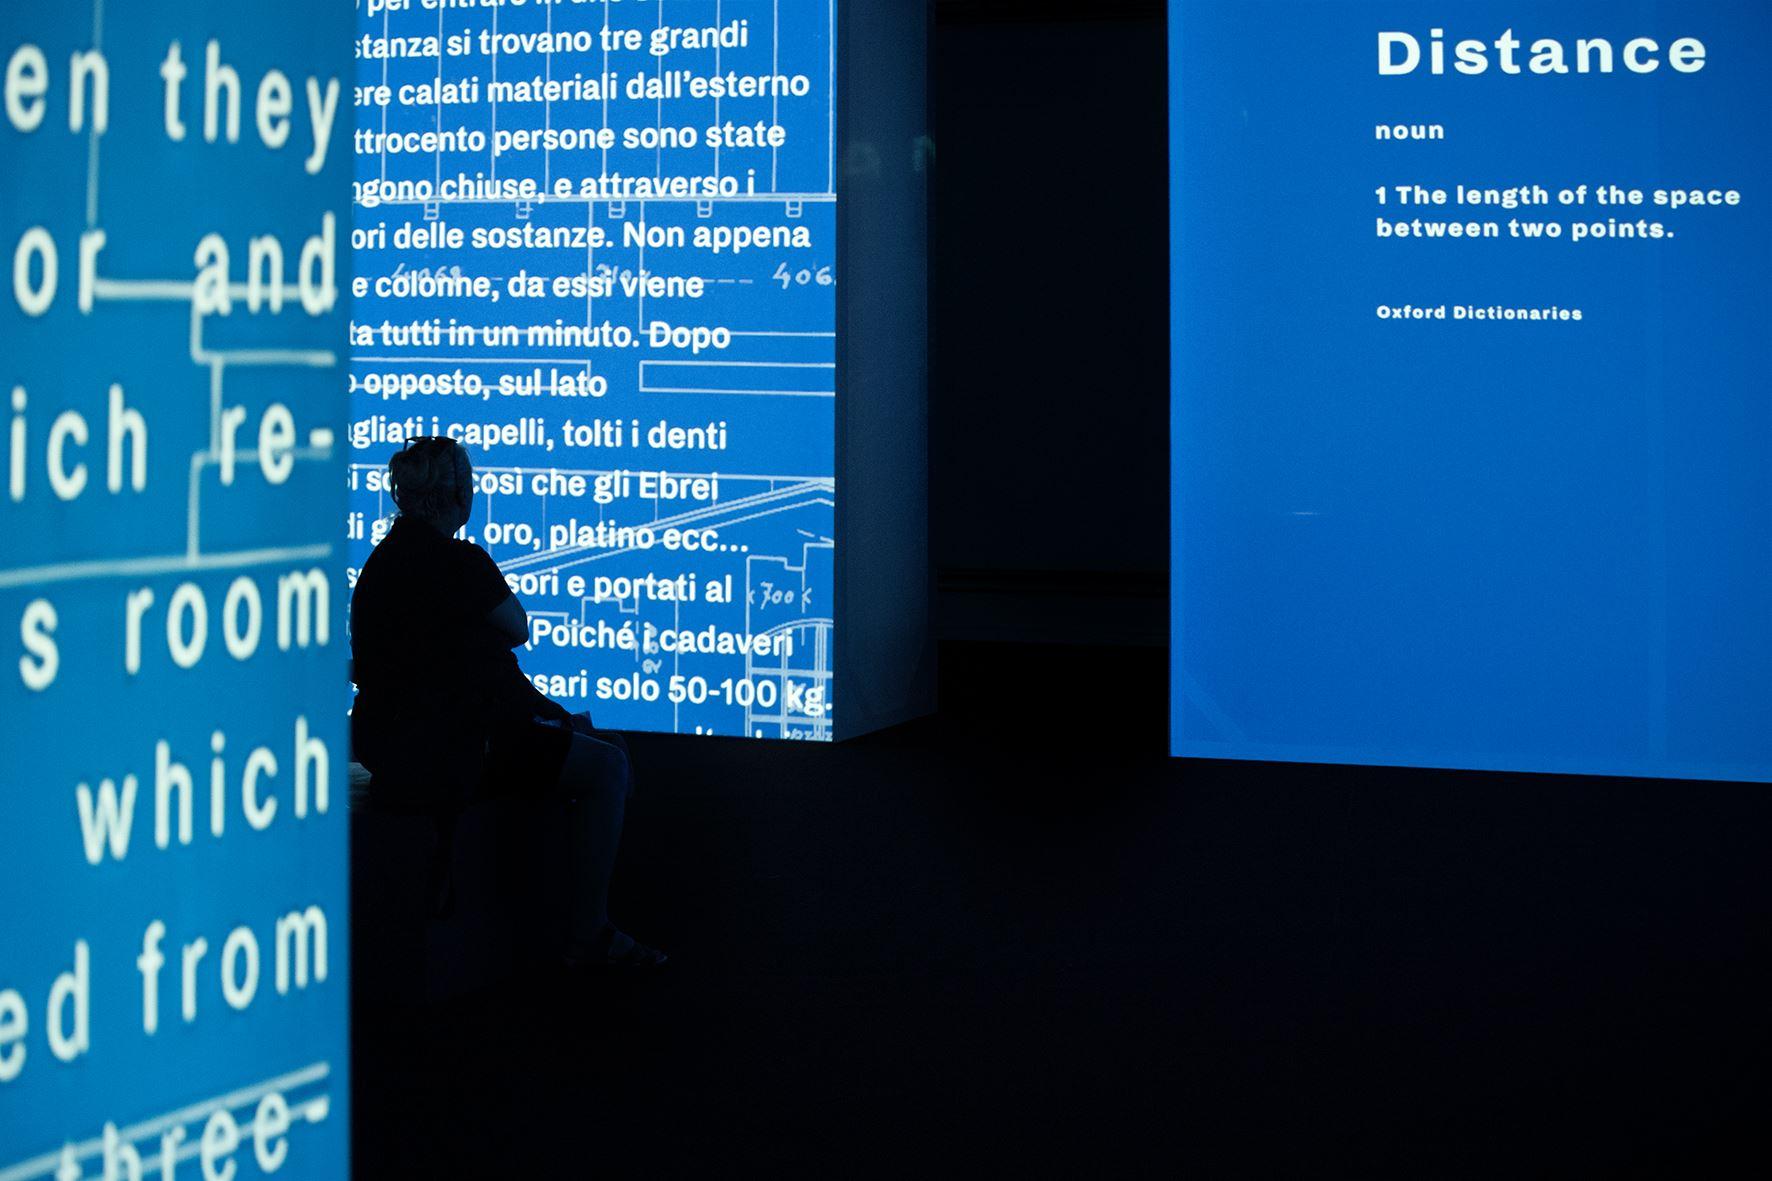 Gustafsson & Haapoja Museum of Nonhumanity. Foto ©Ilaria Scarpa/Luca Telleschi